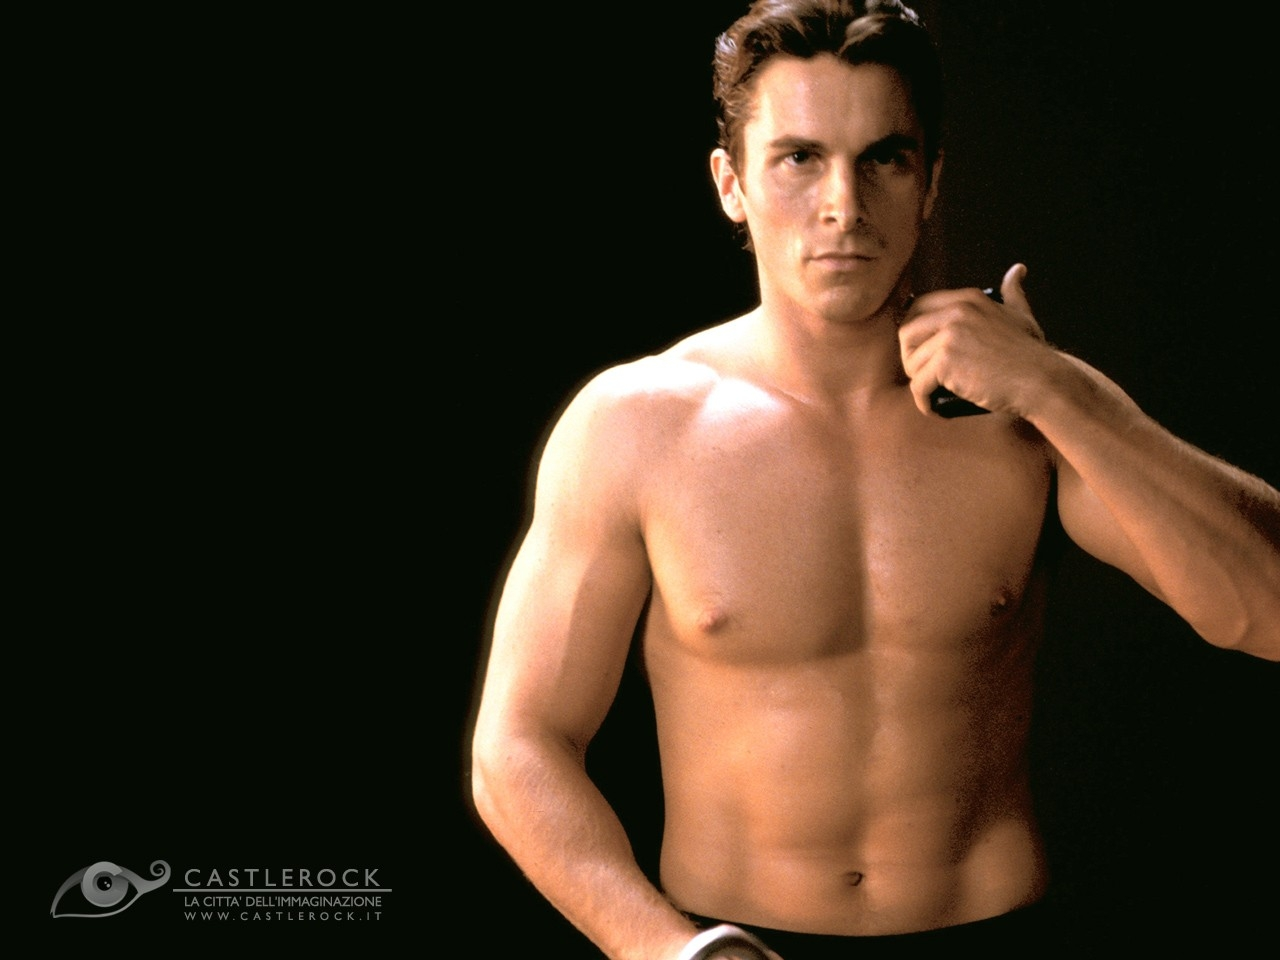 Wallpaper sexy di Christian Bale a torso nudo